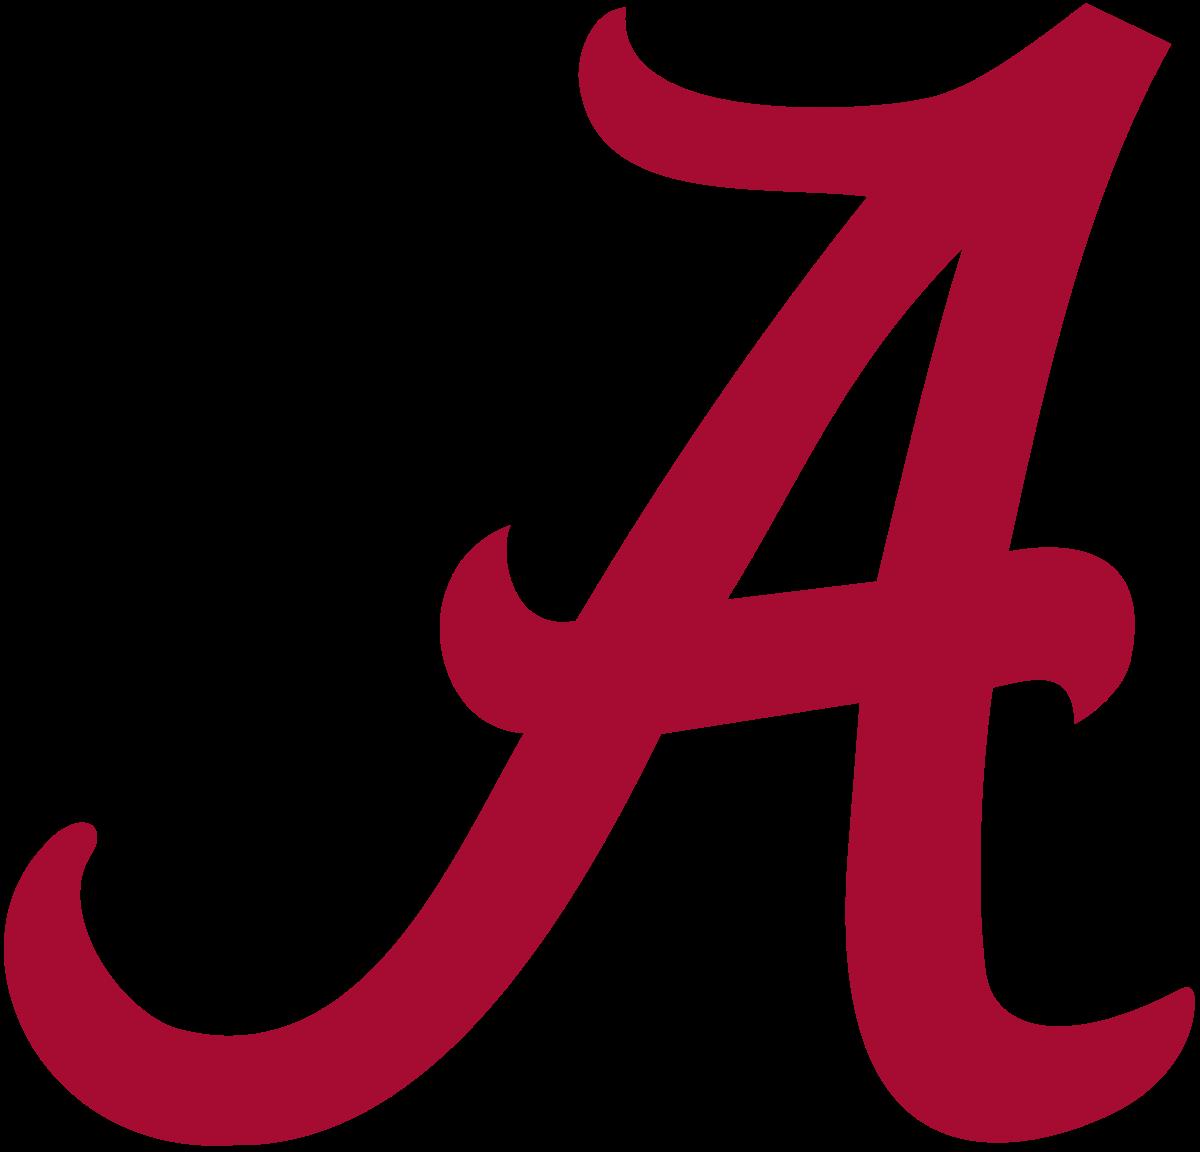 Alabama crimson tide wikipedia. Gymnastics clipart iron cross